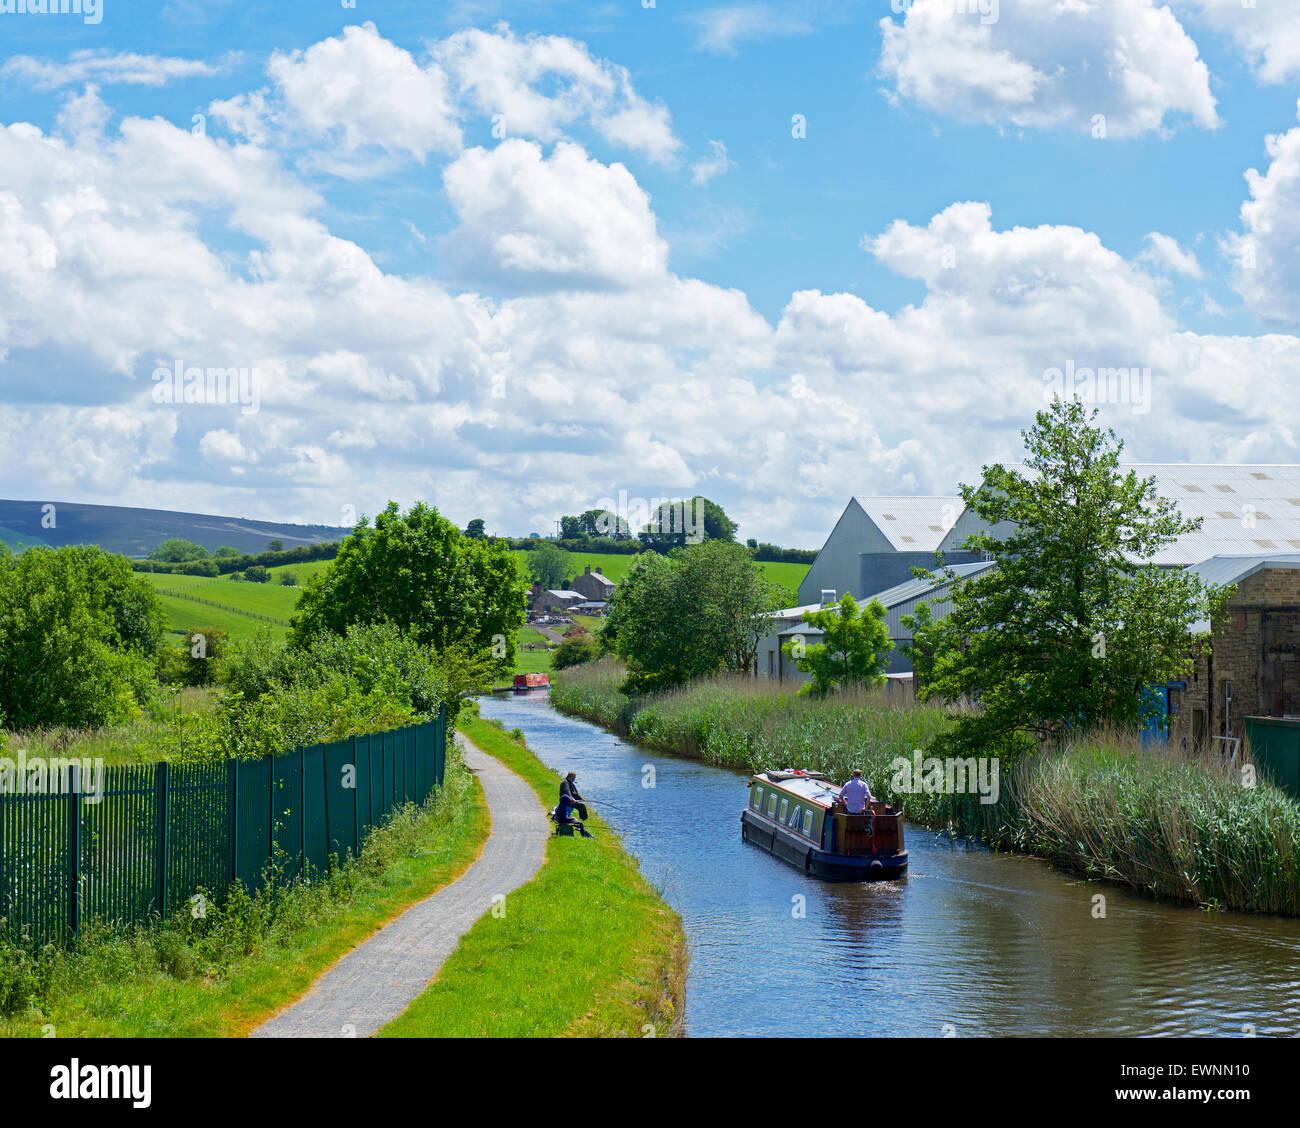 Narrowboat and angler on the Leeds and Liverpool Canal near Barnoldswick, Lancashire, England UK - Stock Image